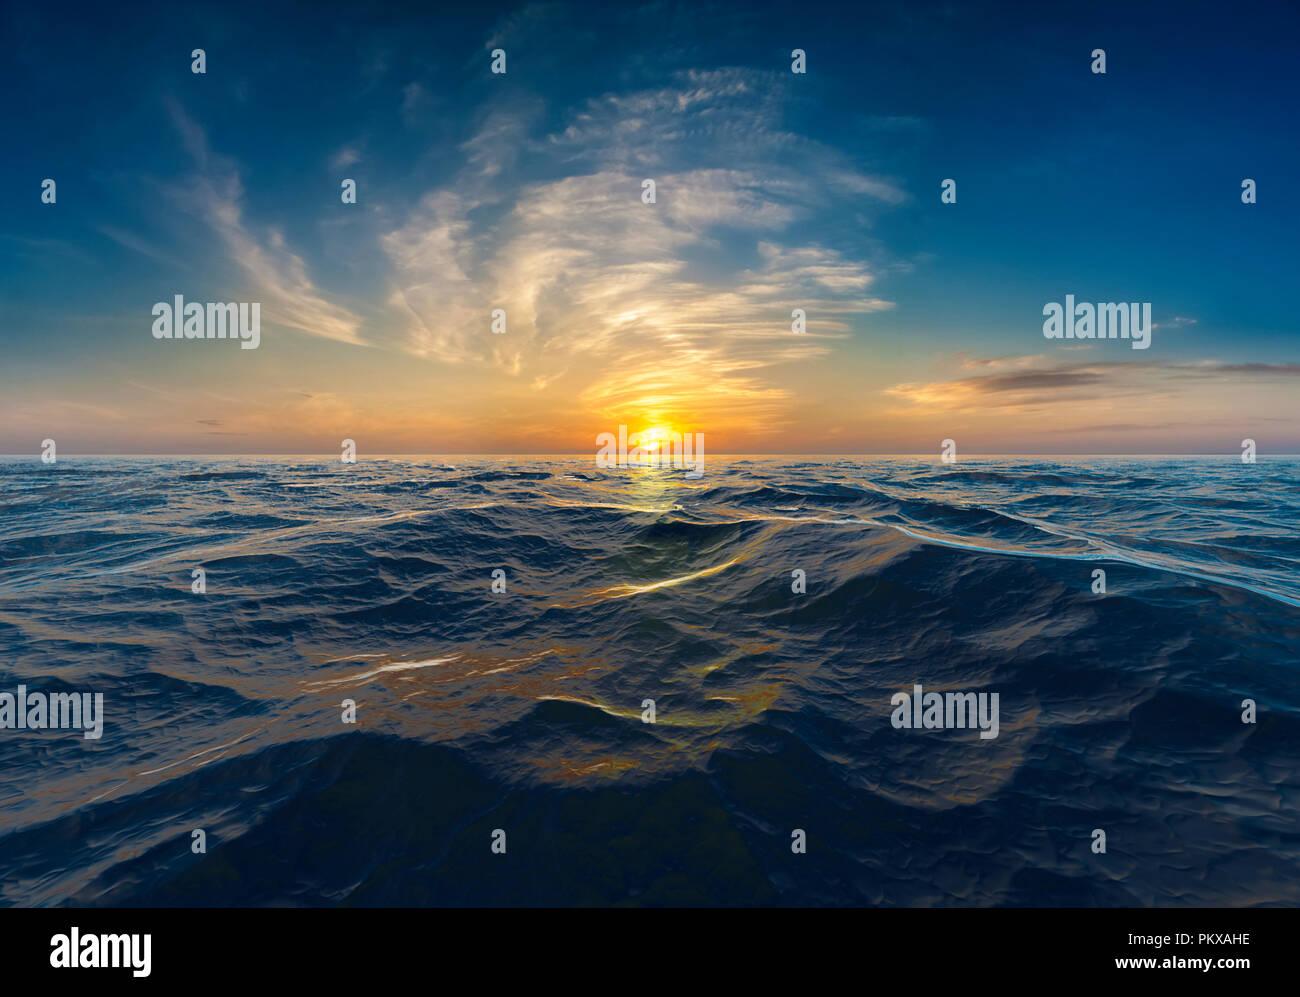 Sunset or sunrise over choppy water - Stock Image